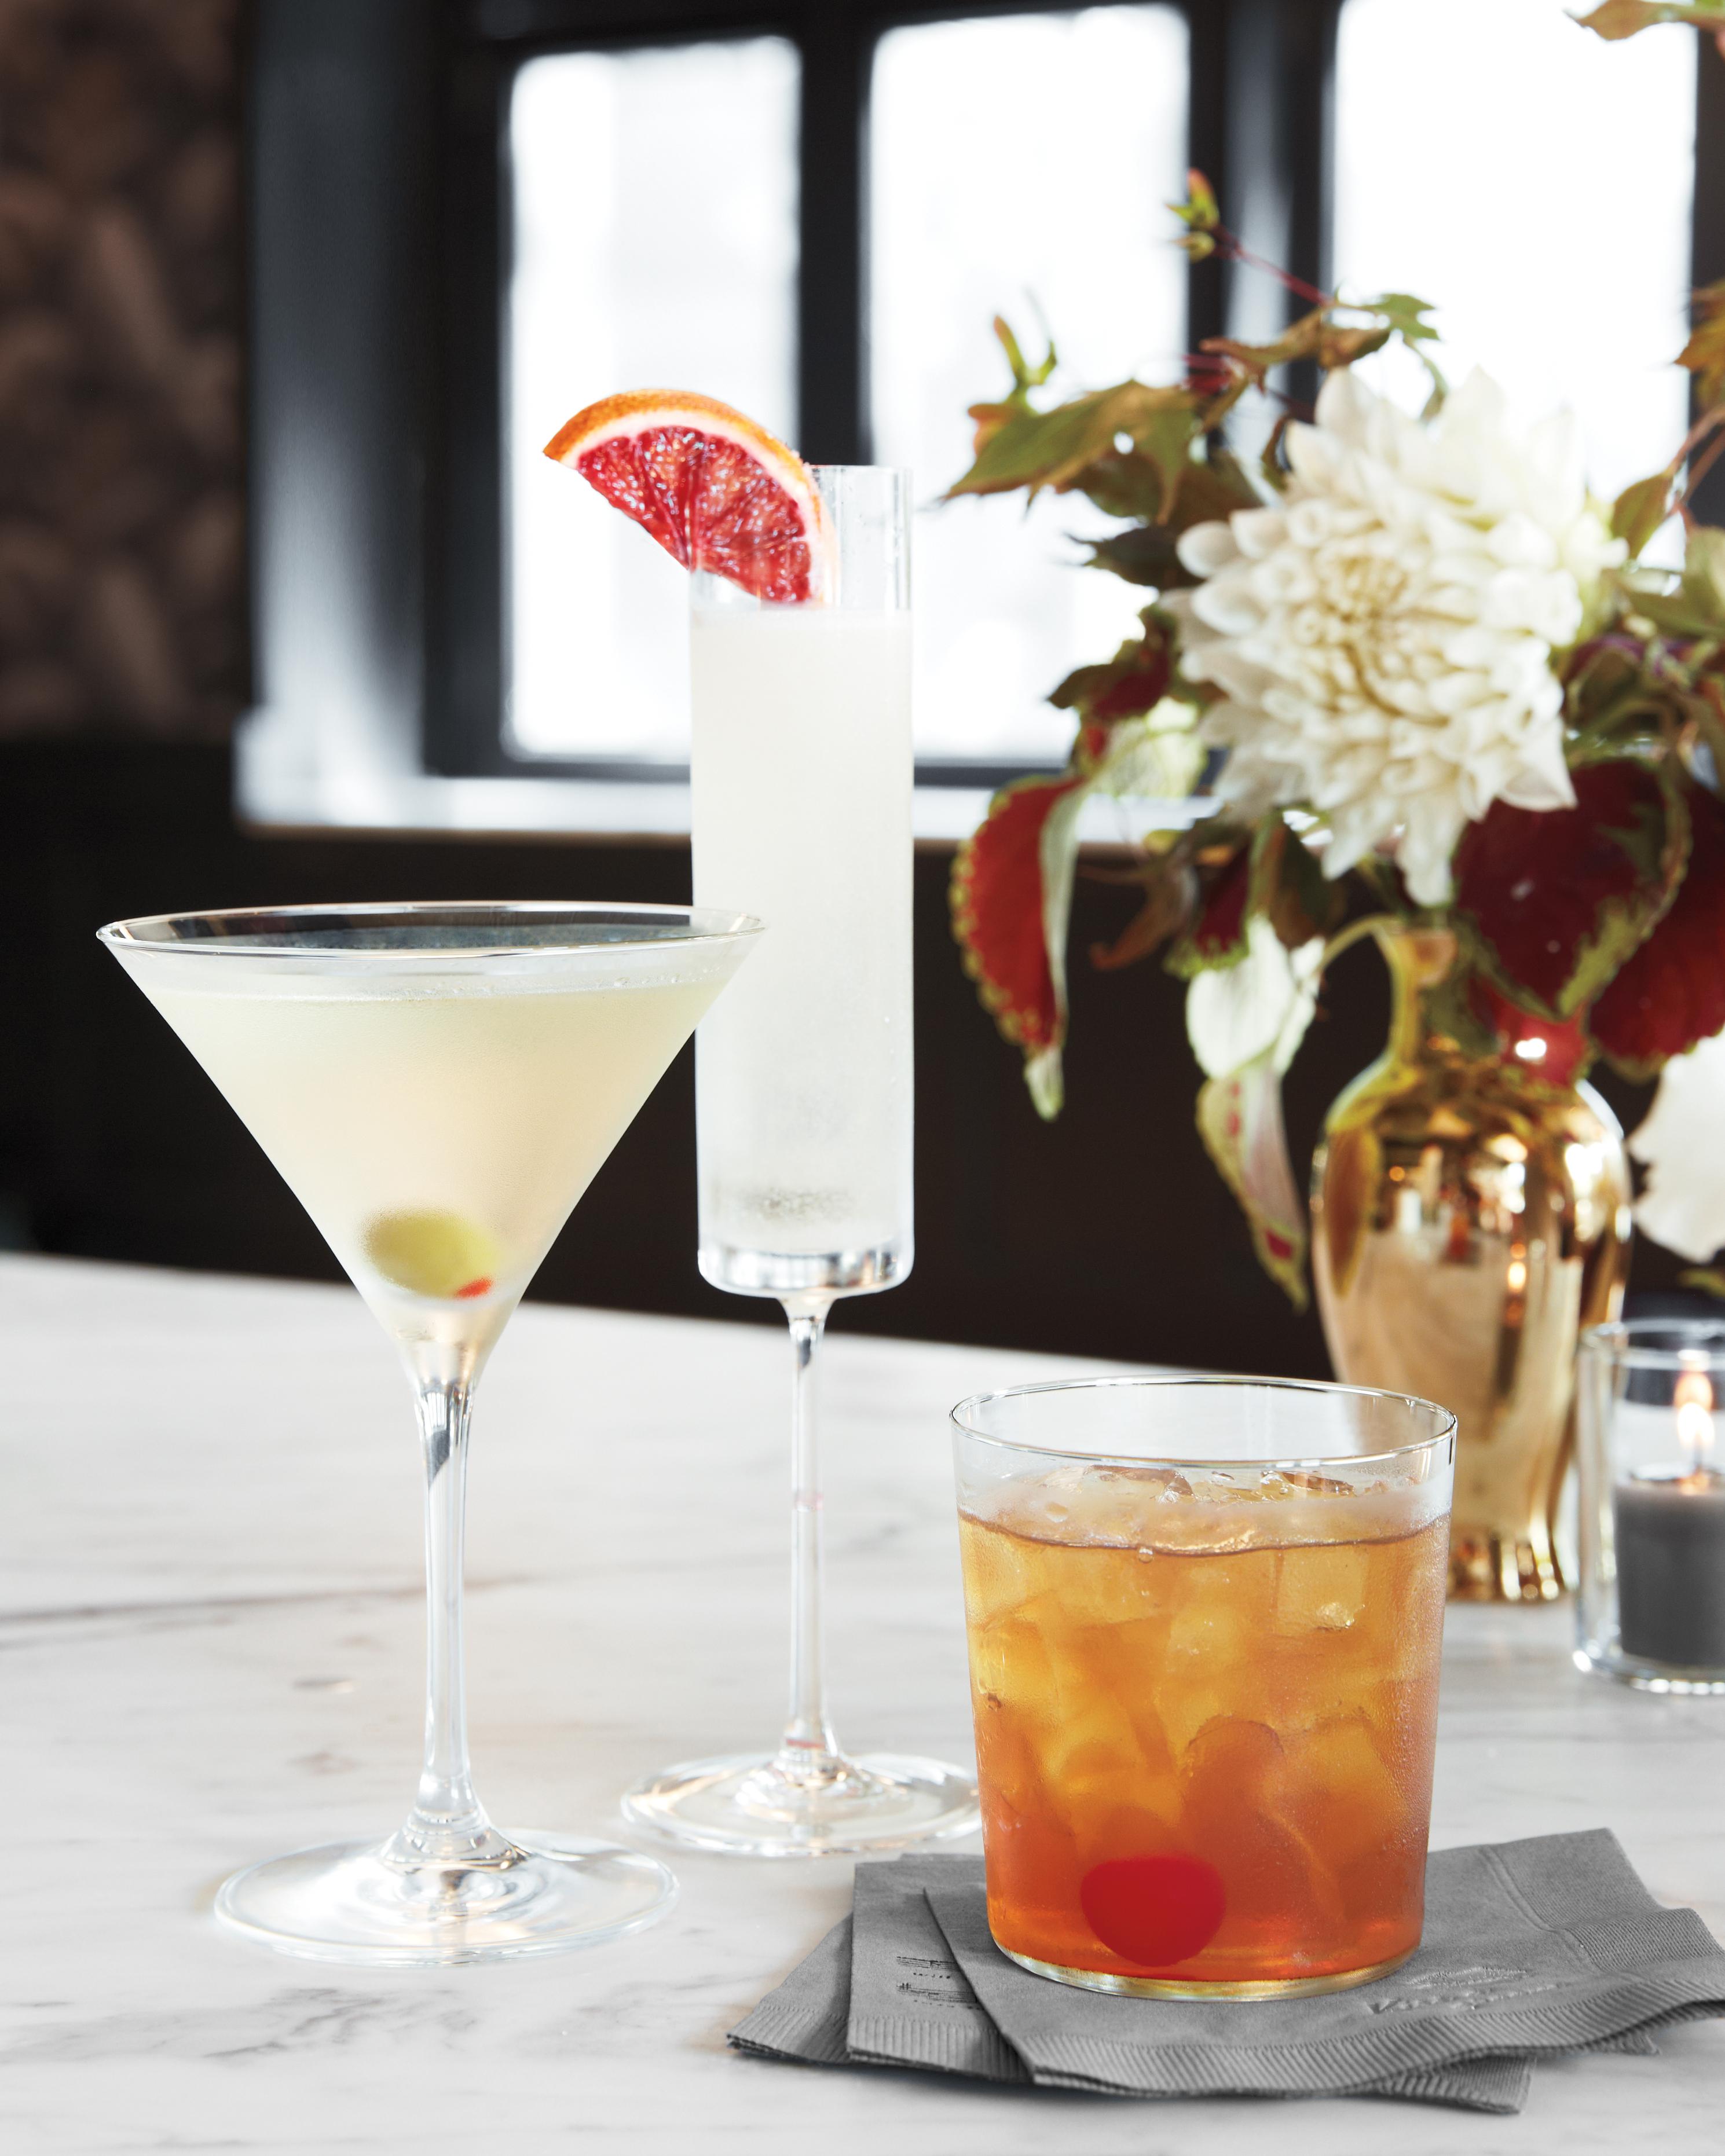 rw-anthony-rusty-cocktails-13-354-00526-wd110176.jpg